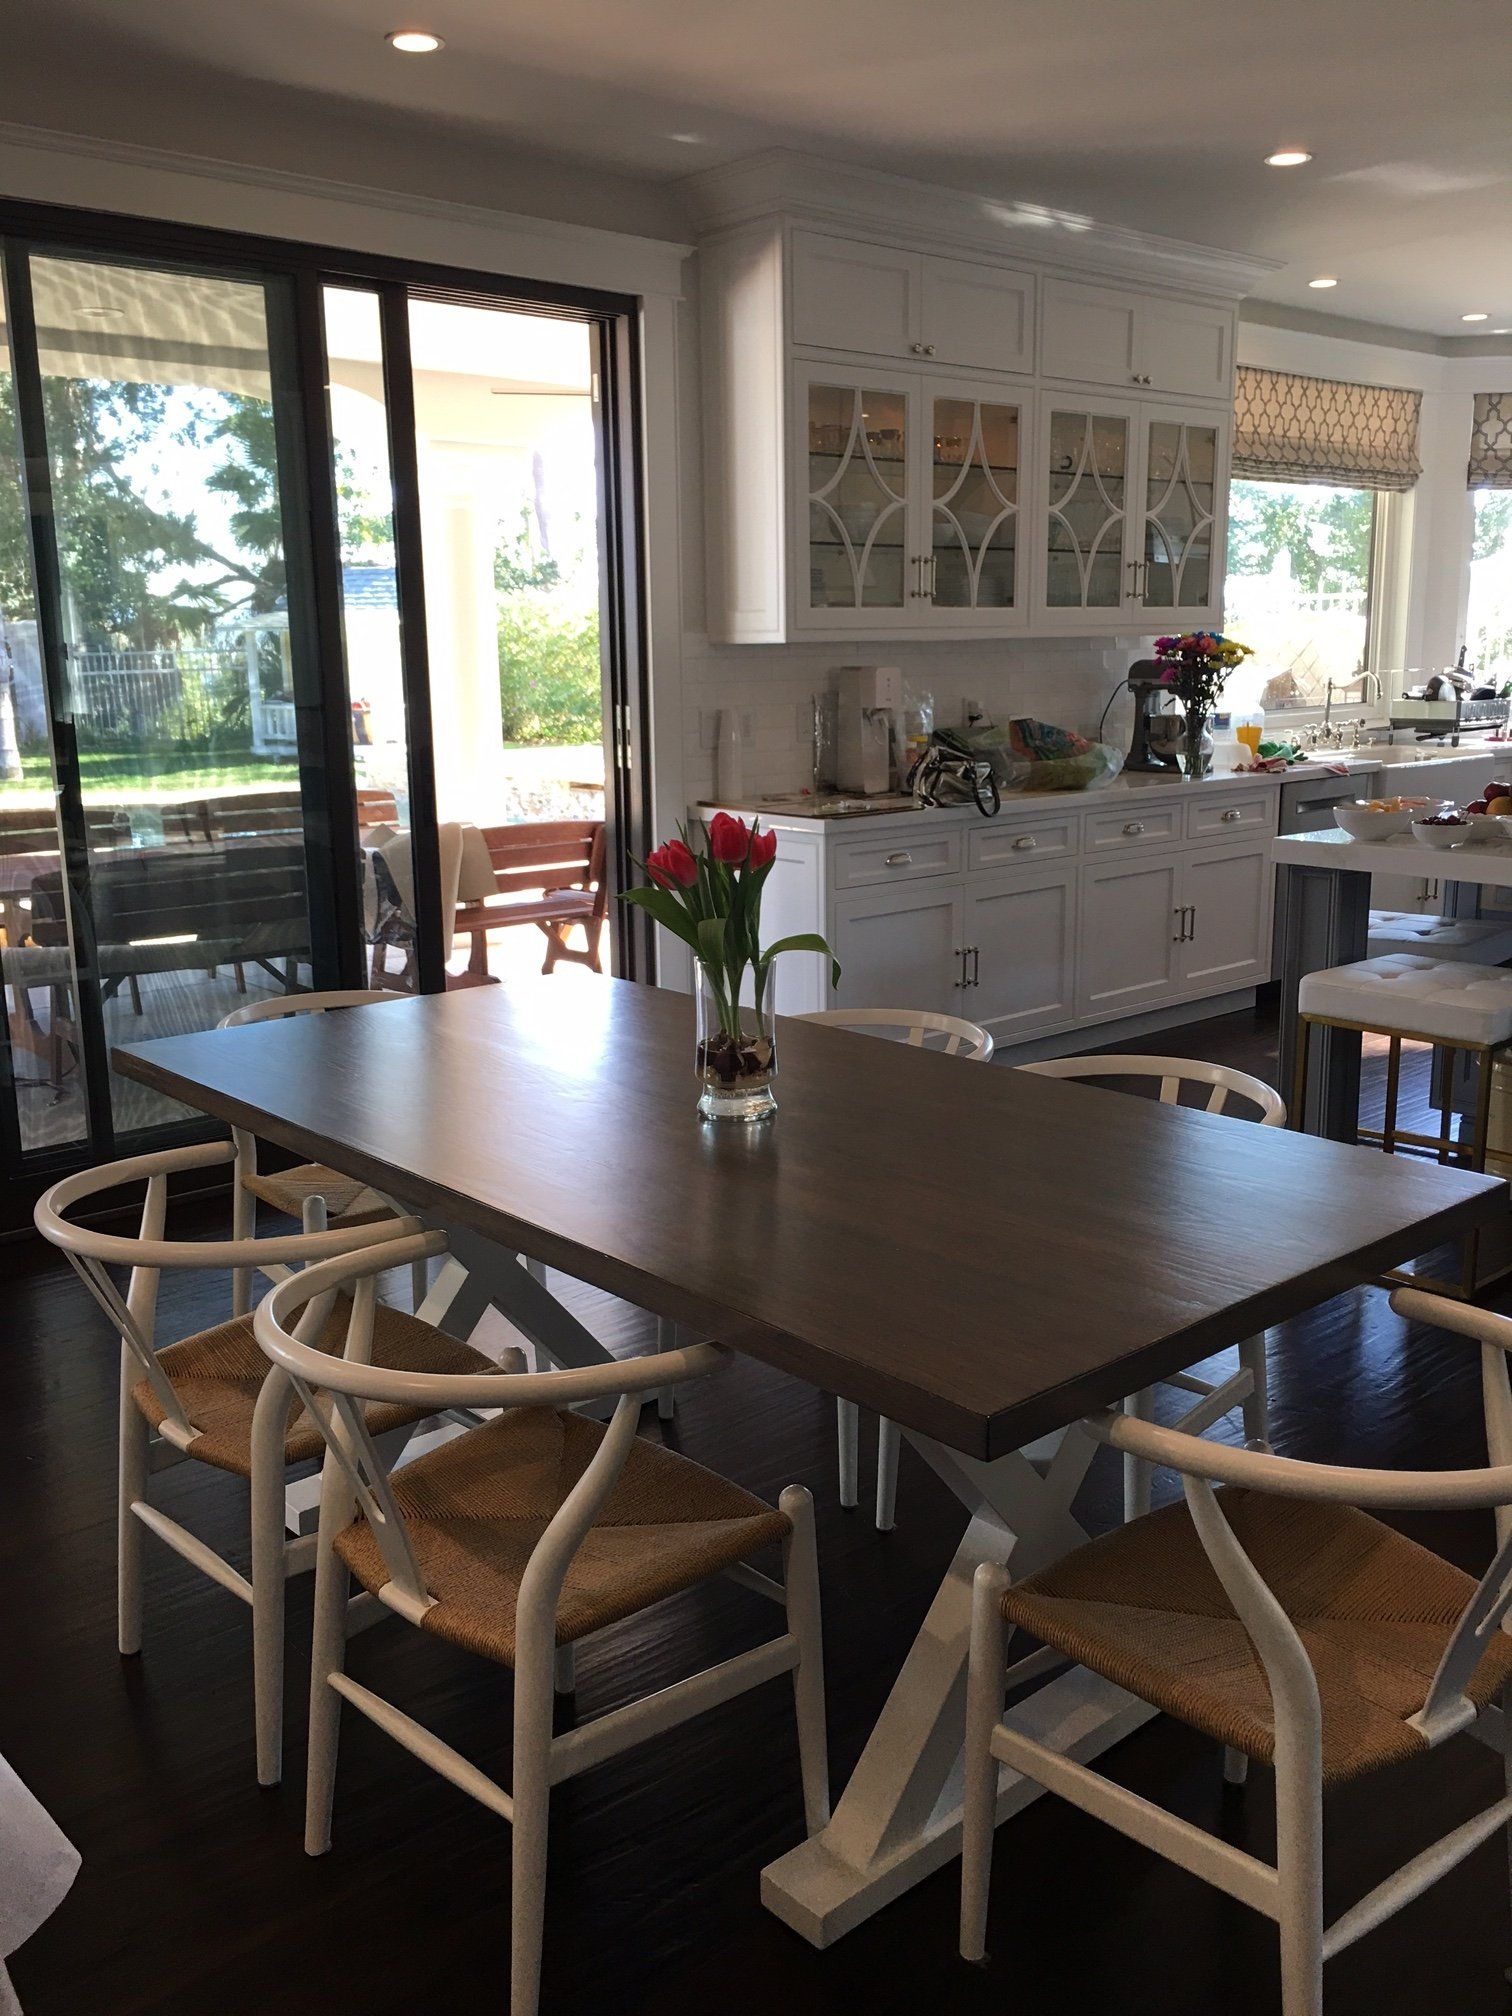 White Oak X Base Dining Table Kitchen Room Design White Kitchen